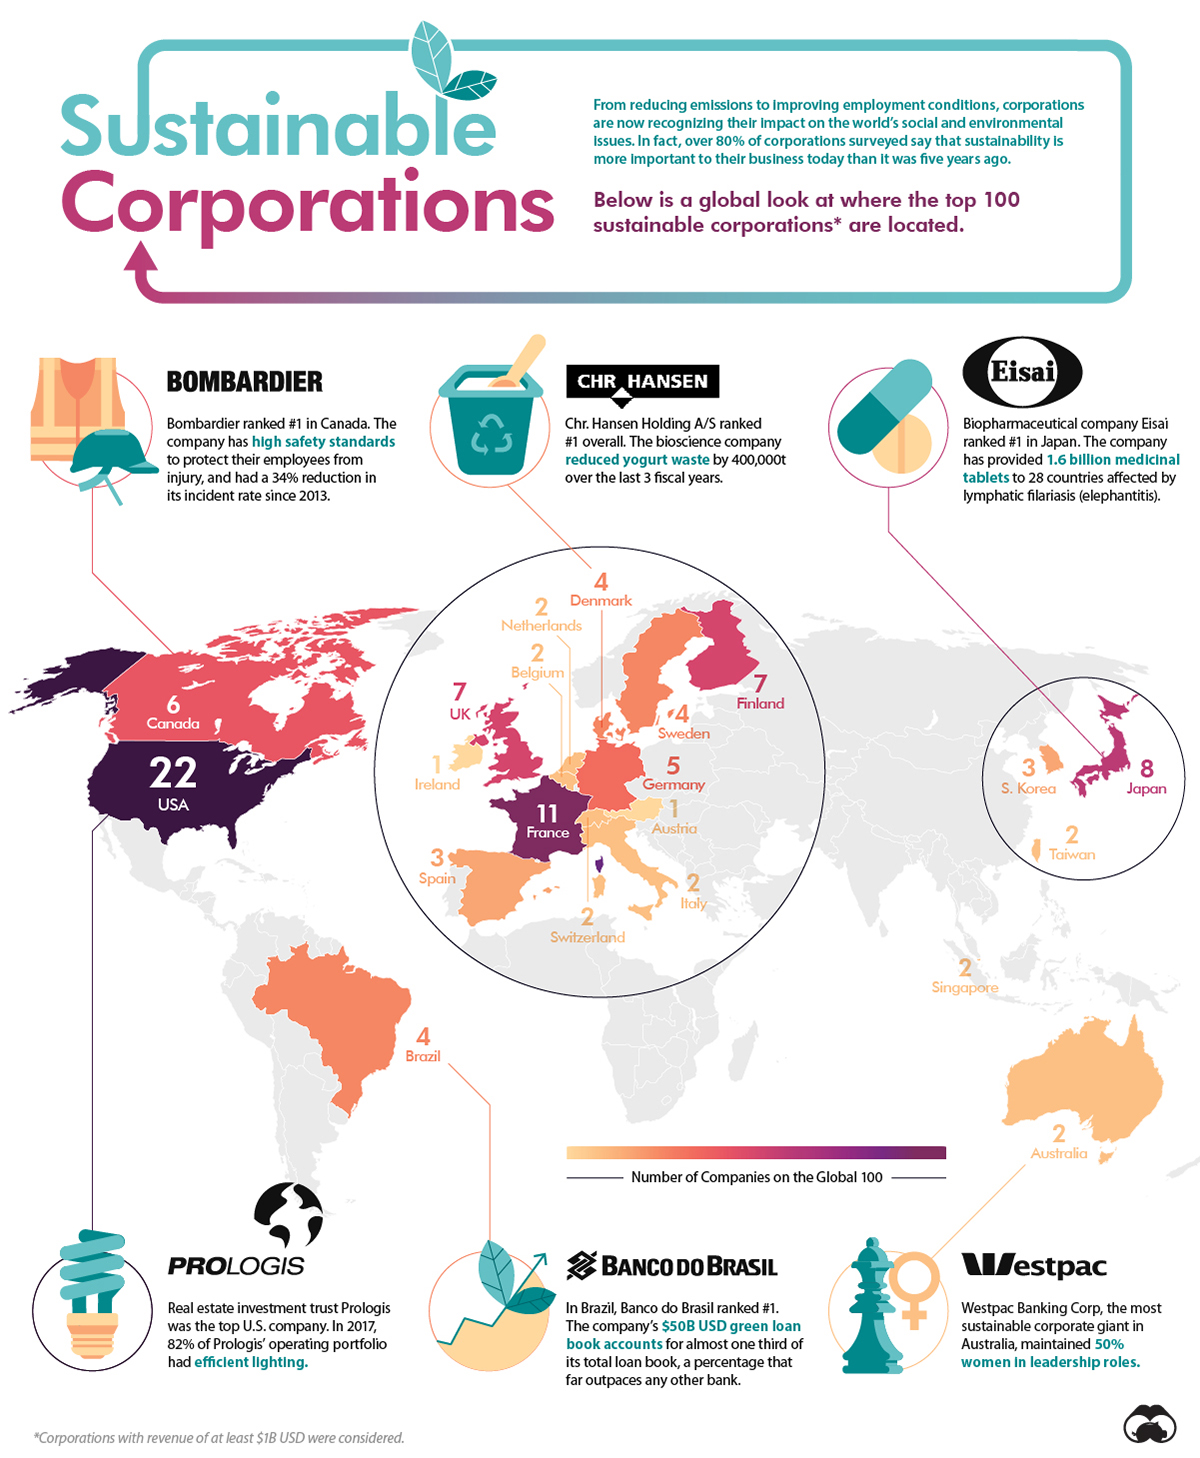 Sustainable Corporate Giants